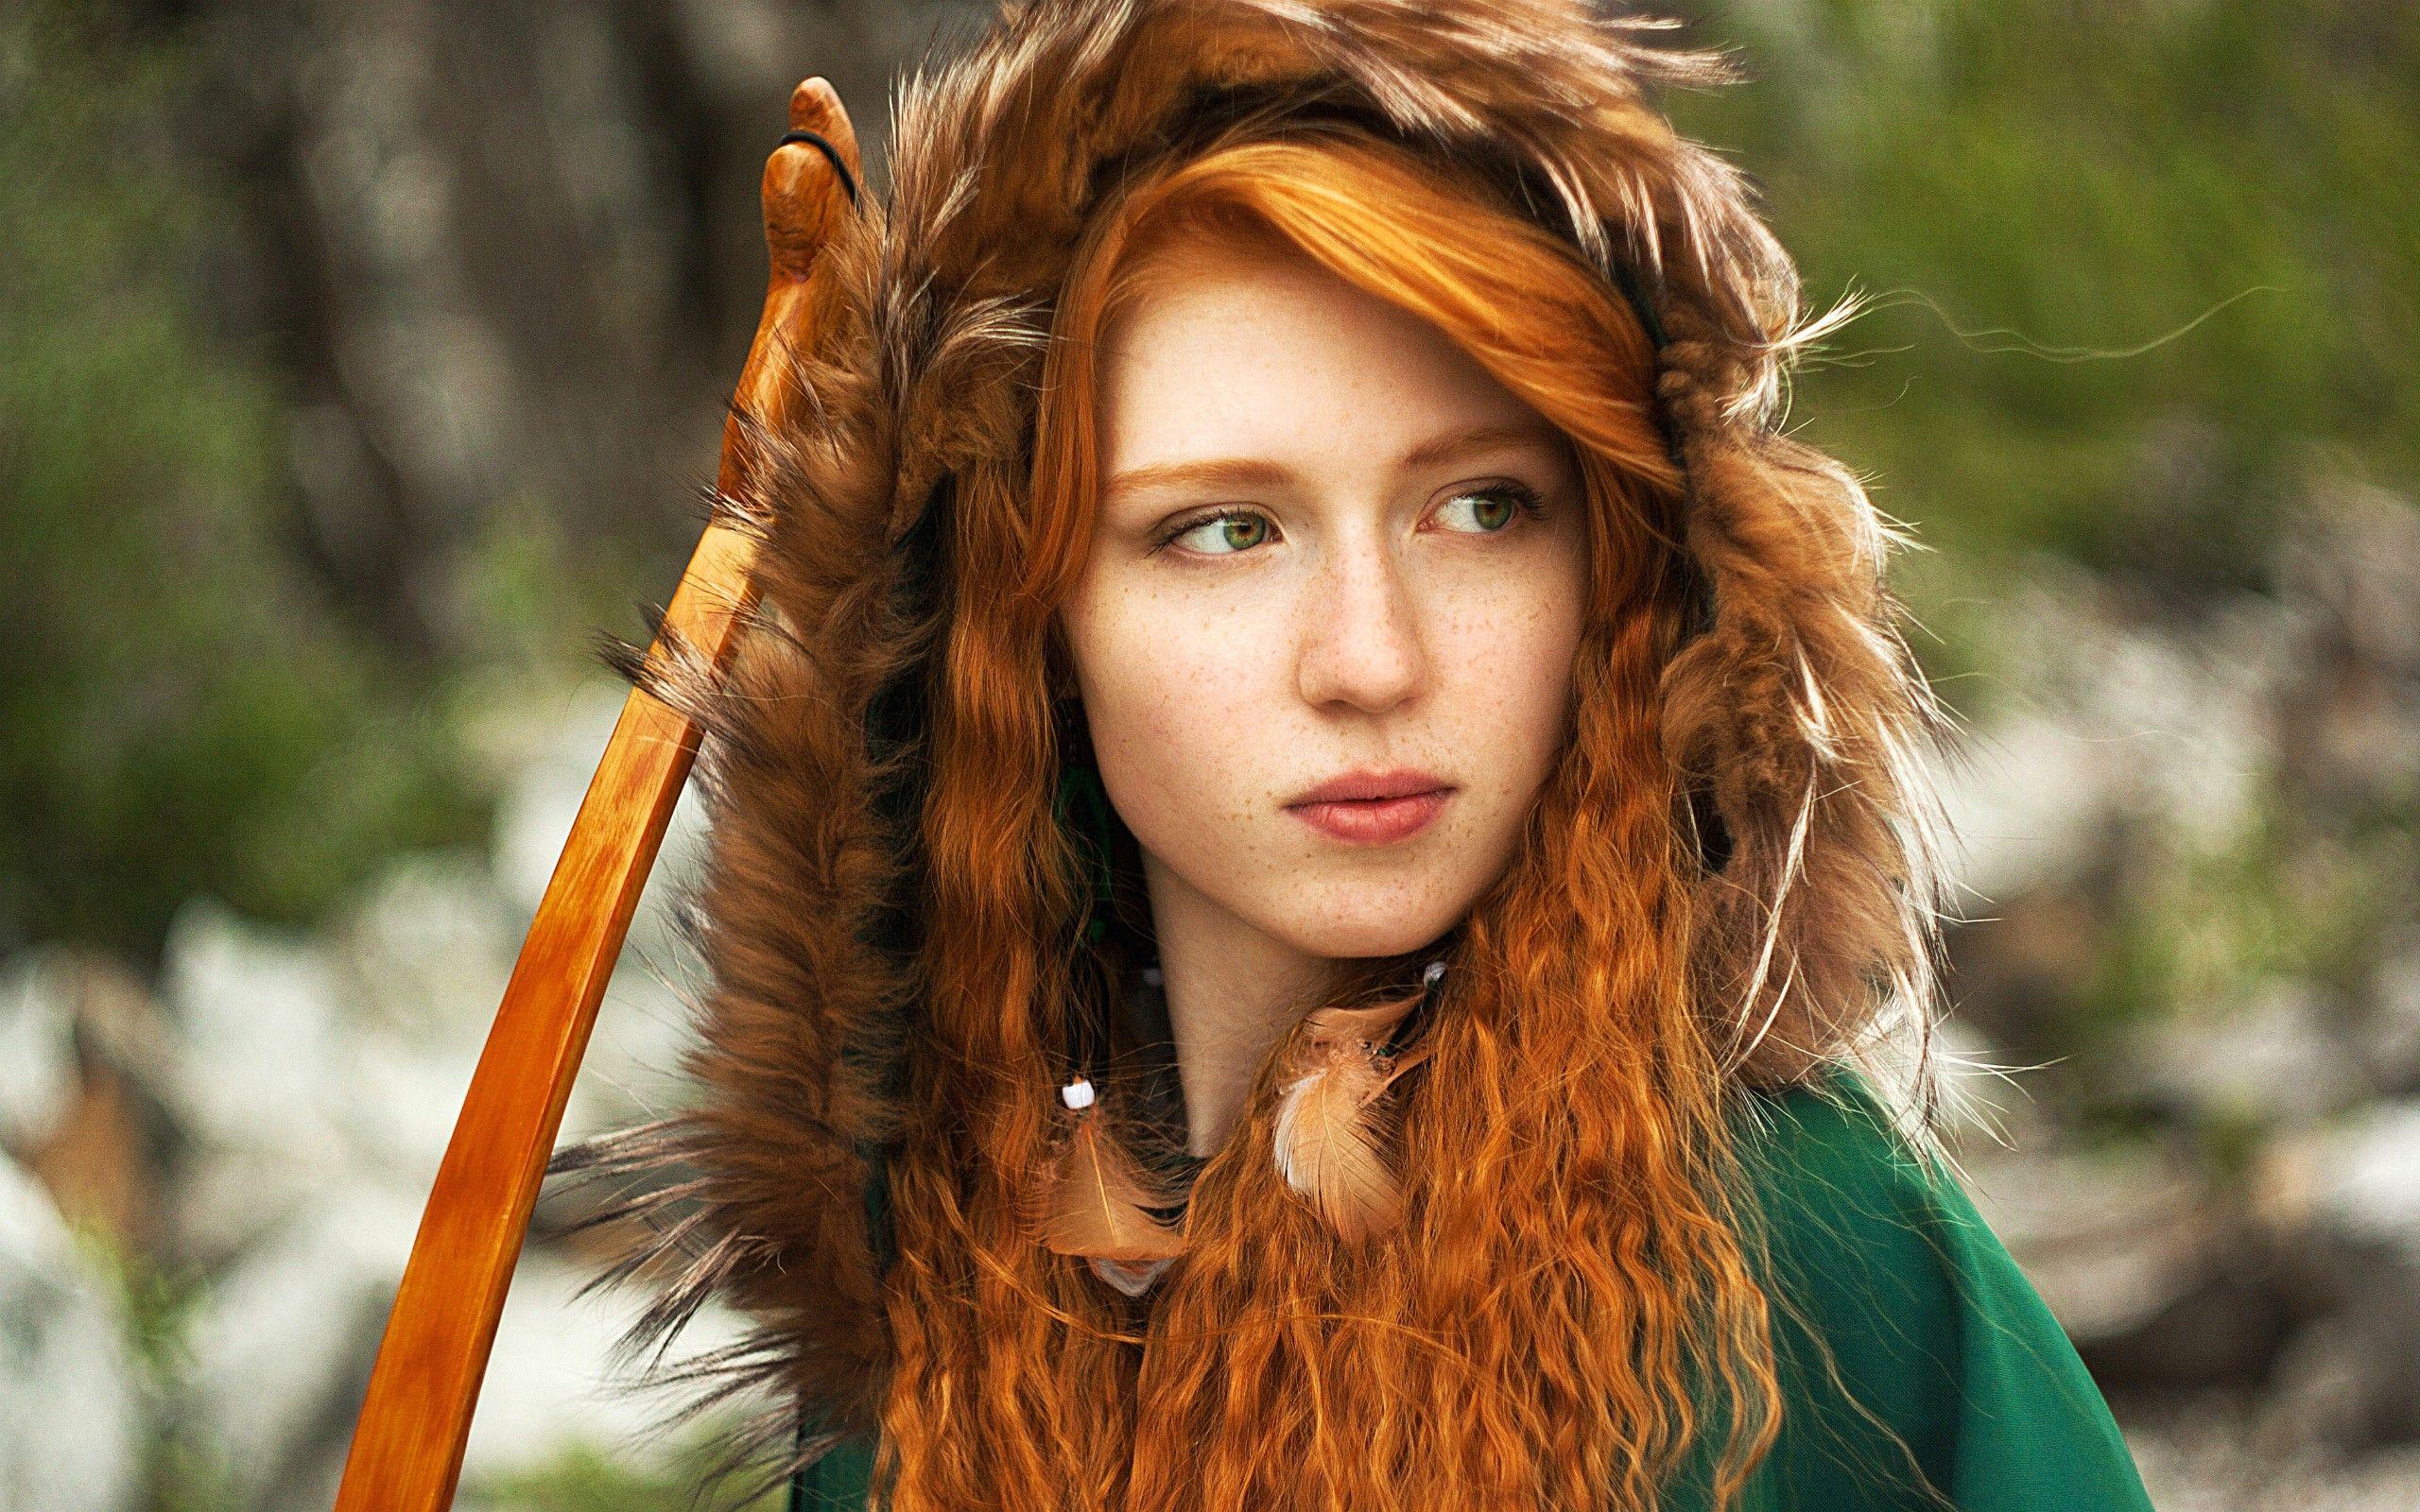 I got 99 Problems but a Redhead ain't one - Imgur